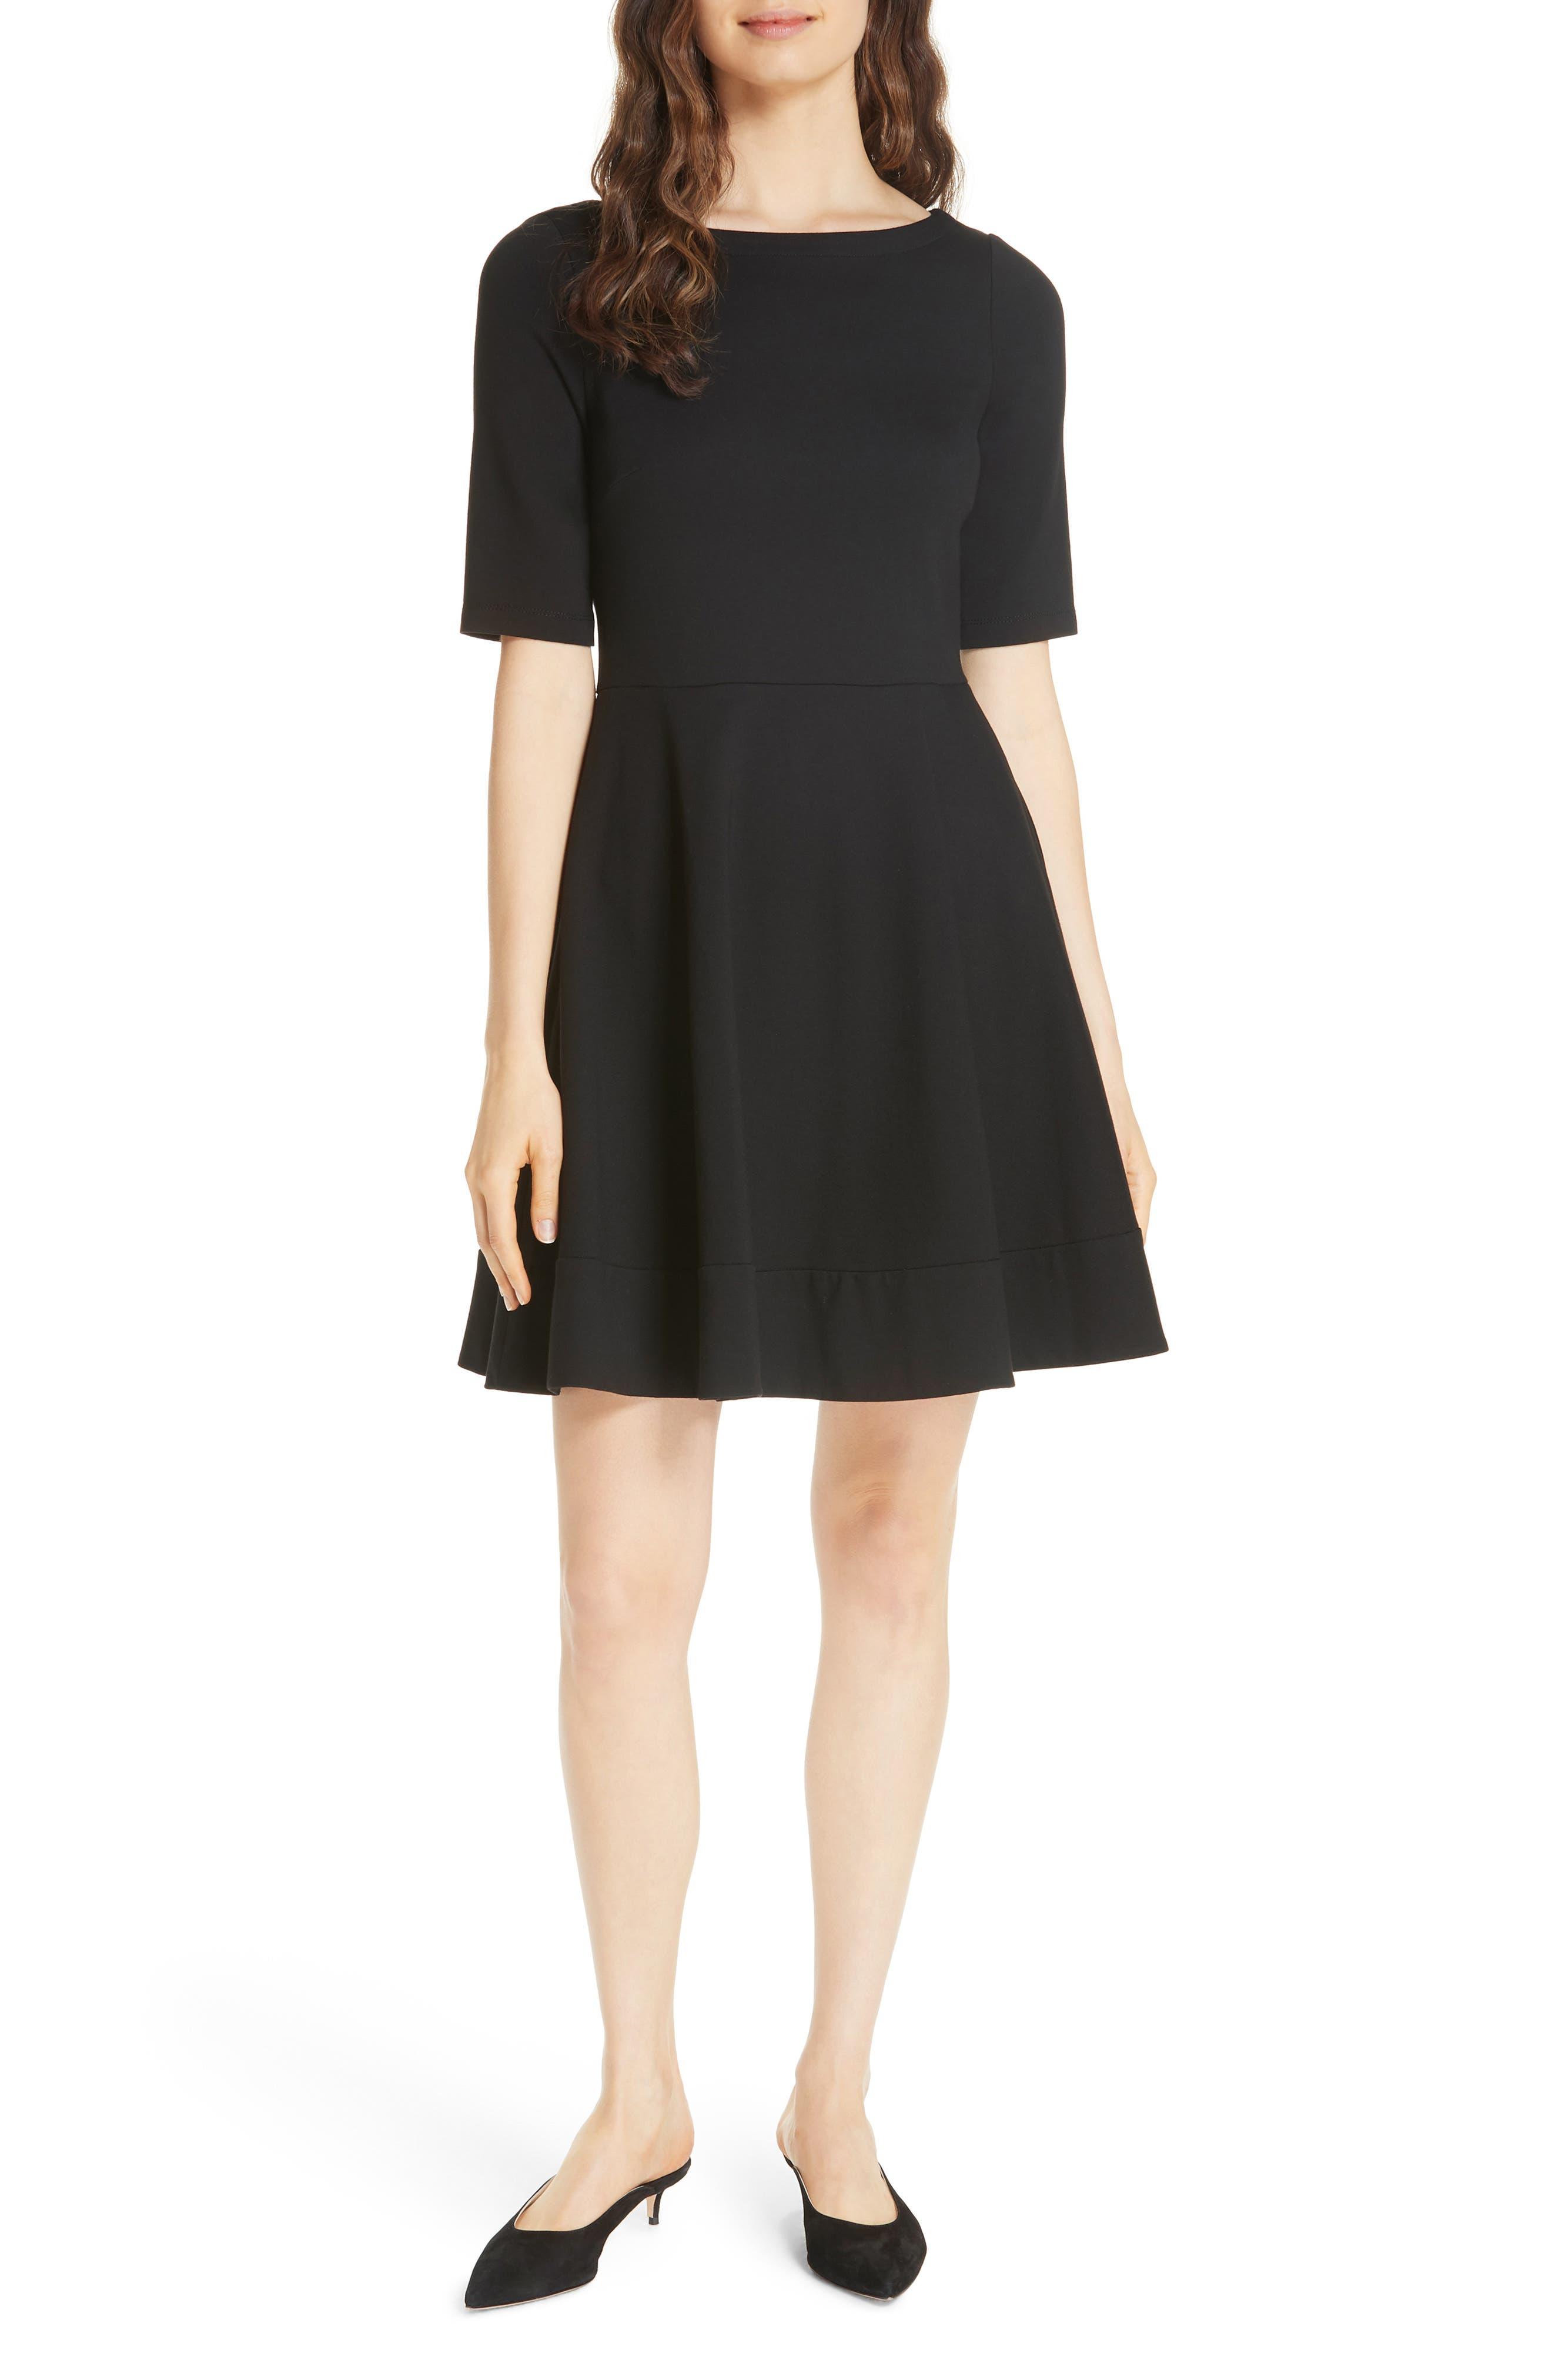 Kate Spade New York Lace-Up Ponte Dress